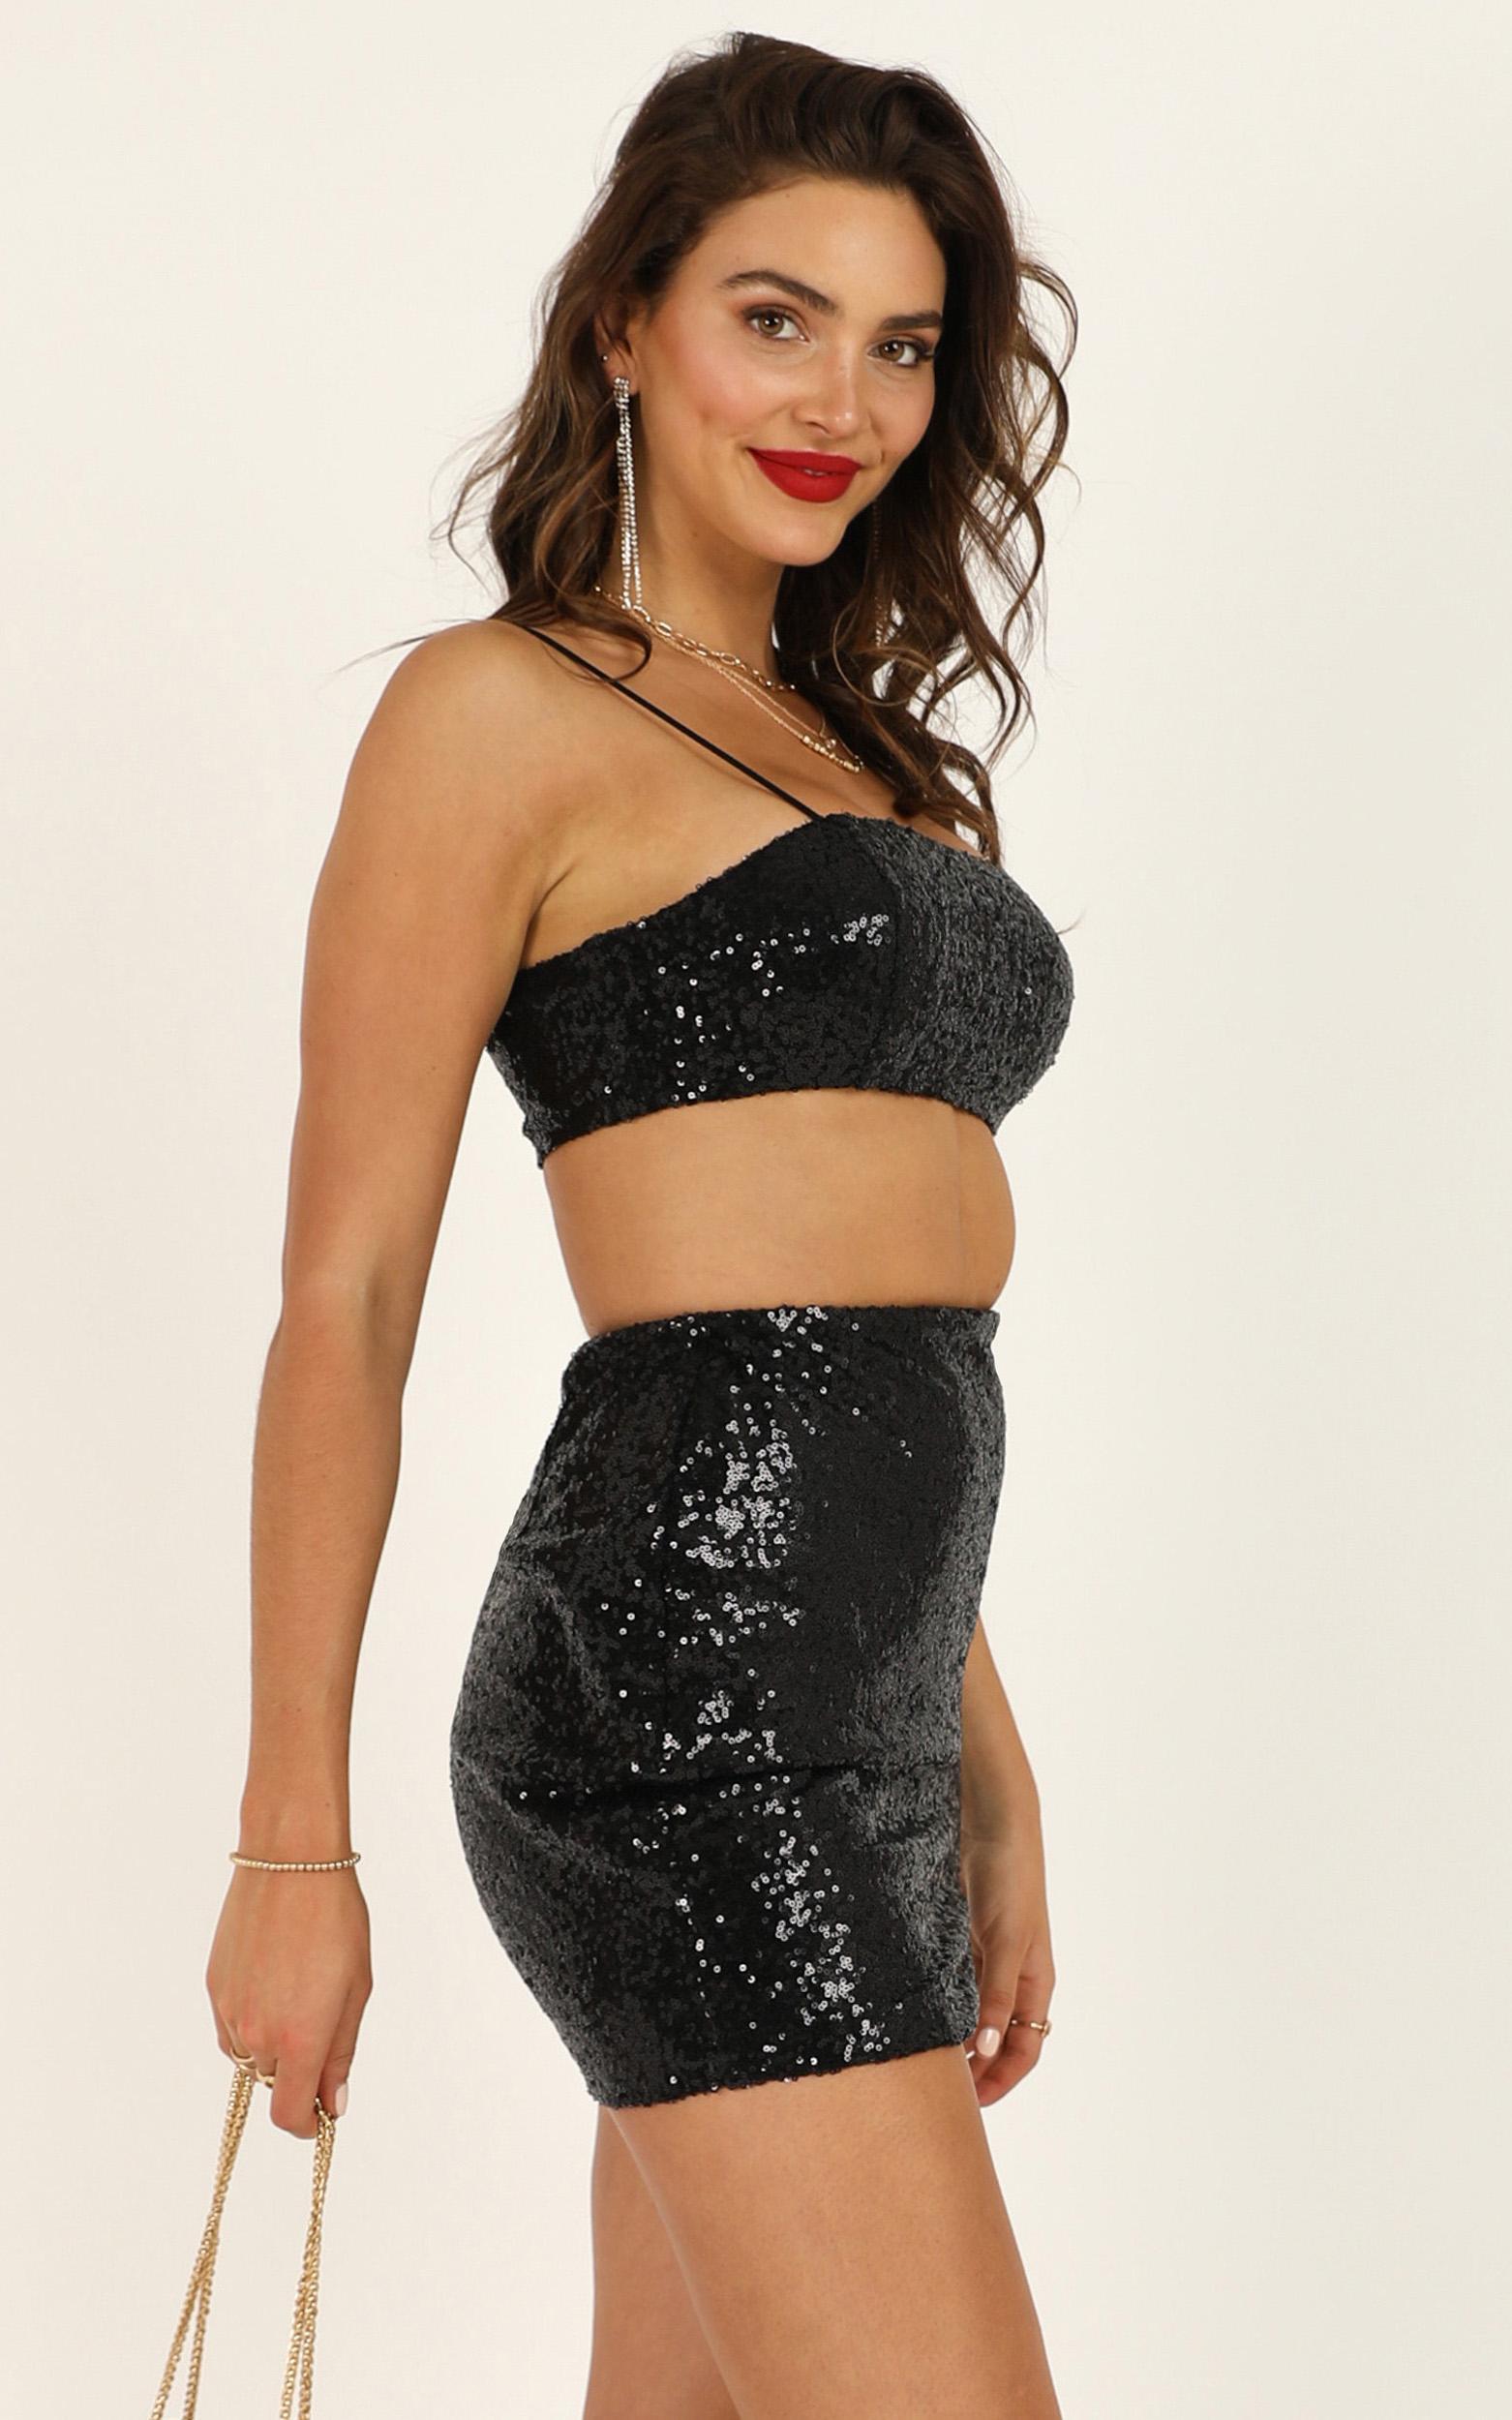 No Invite Necessary Top in black sequin - 14 (XL), Black, hi-res image number null